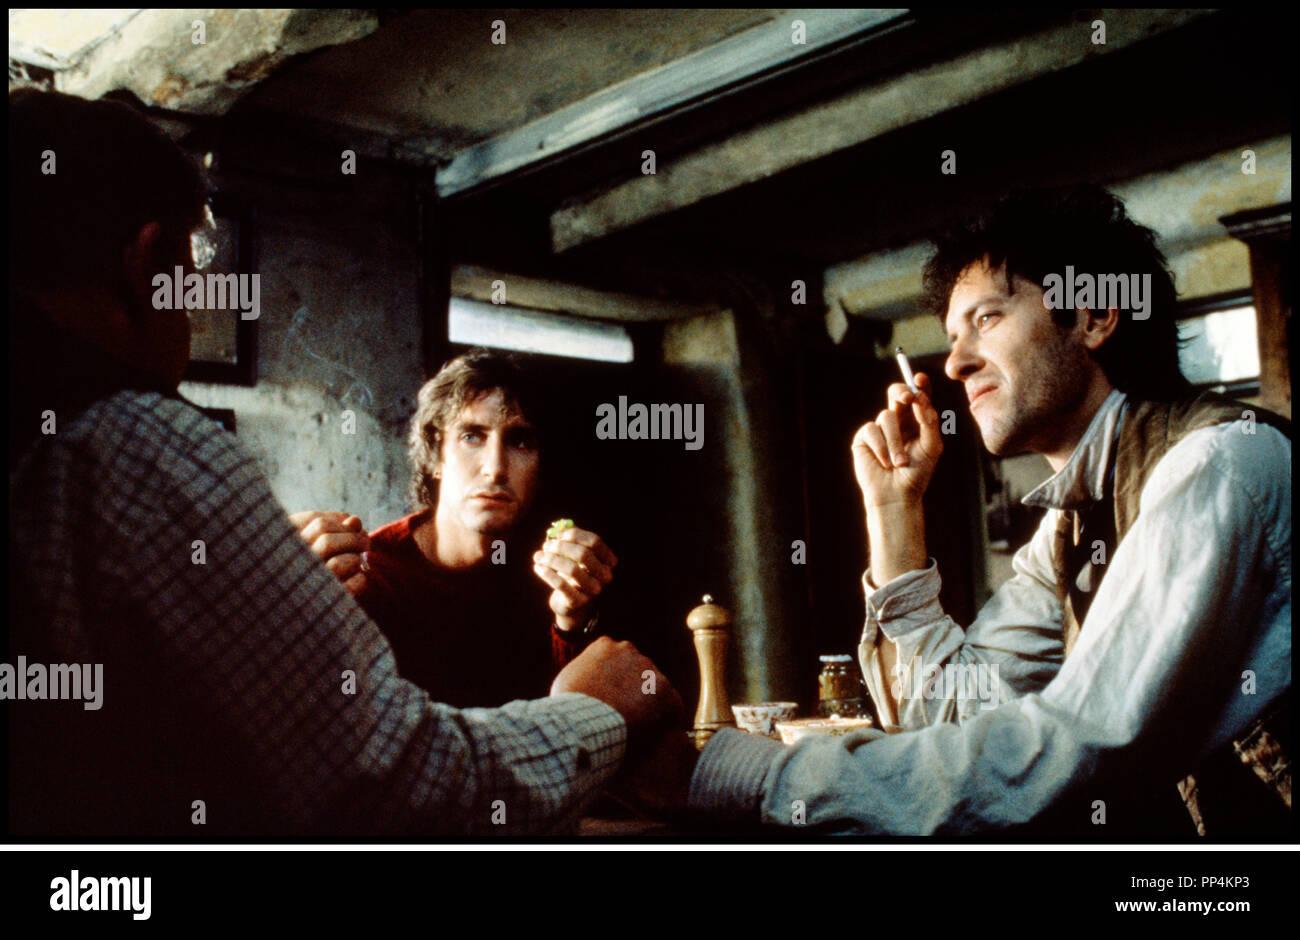 Prod DB © Handmade Films / DR WITHNAIL ET MOI (WITHNAIL & I) de Bruce Robinson 1987 GB repas, cigarette - Stock Image